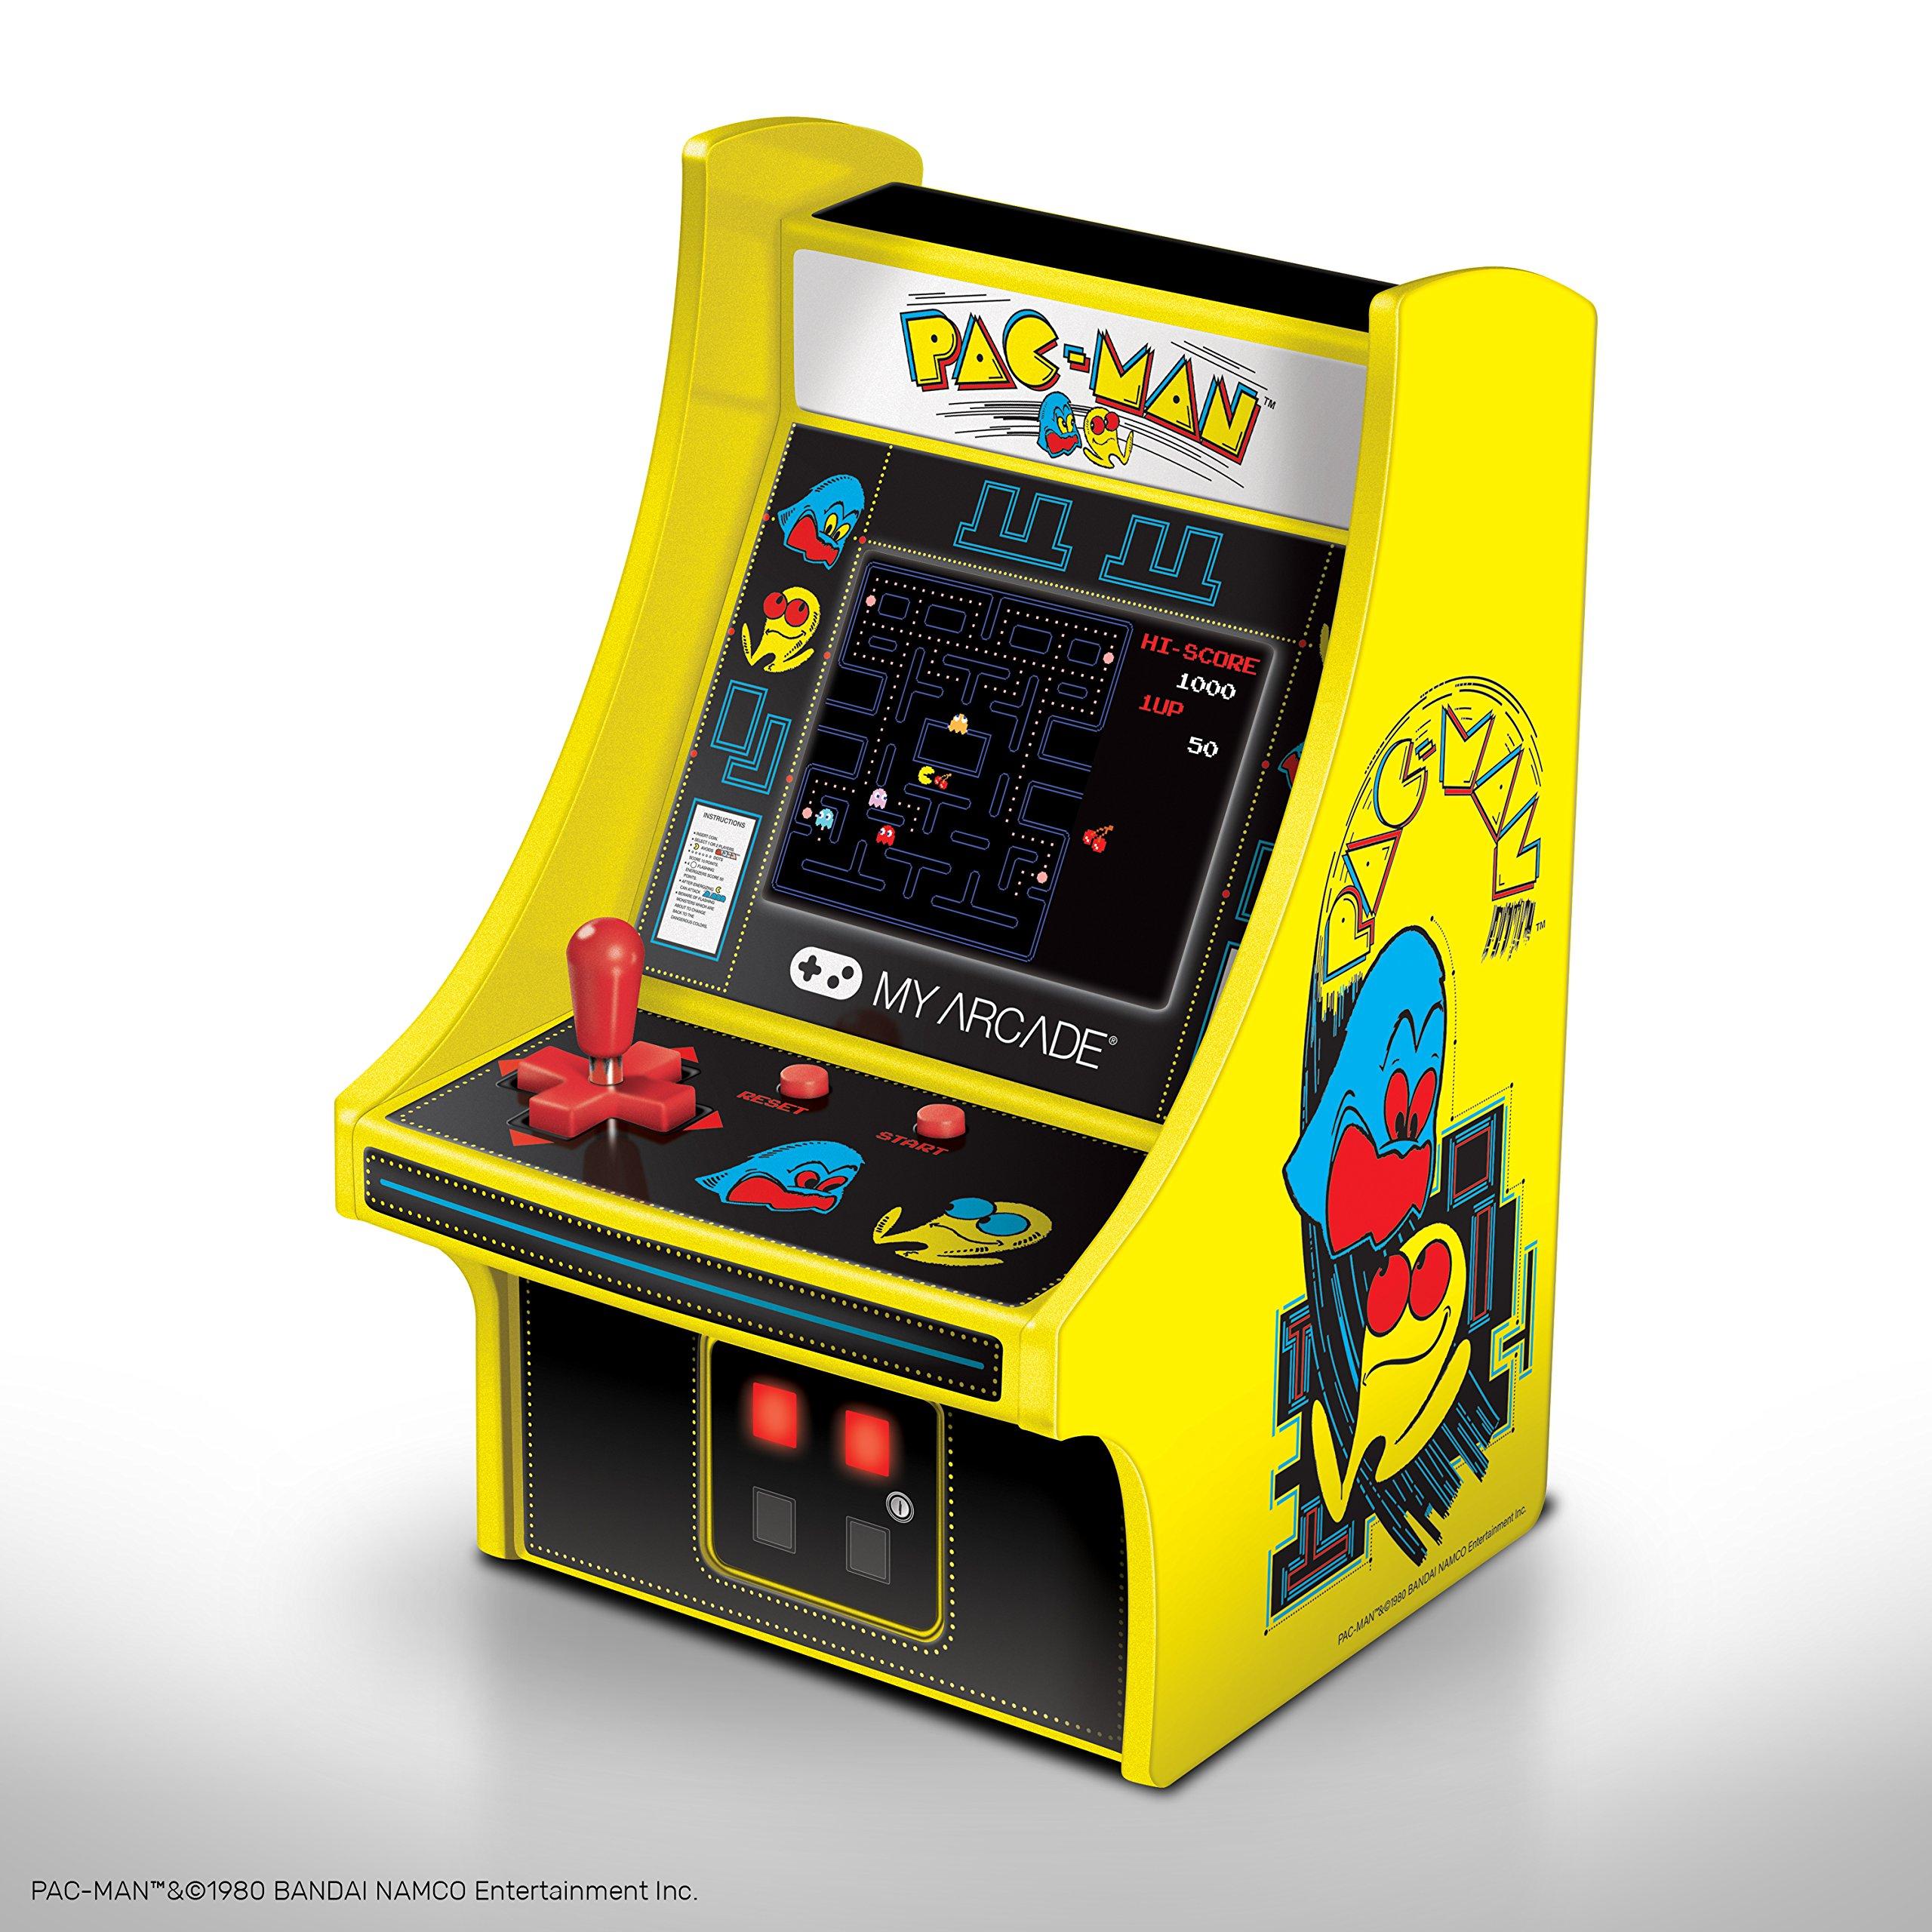 My Arcade PAC-MAN Micro Player 6'' Collectable Arcade